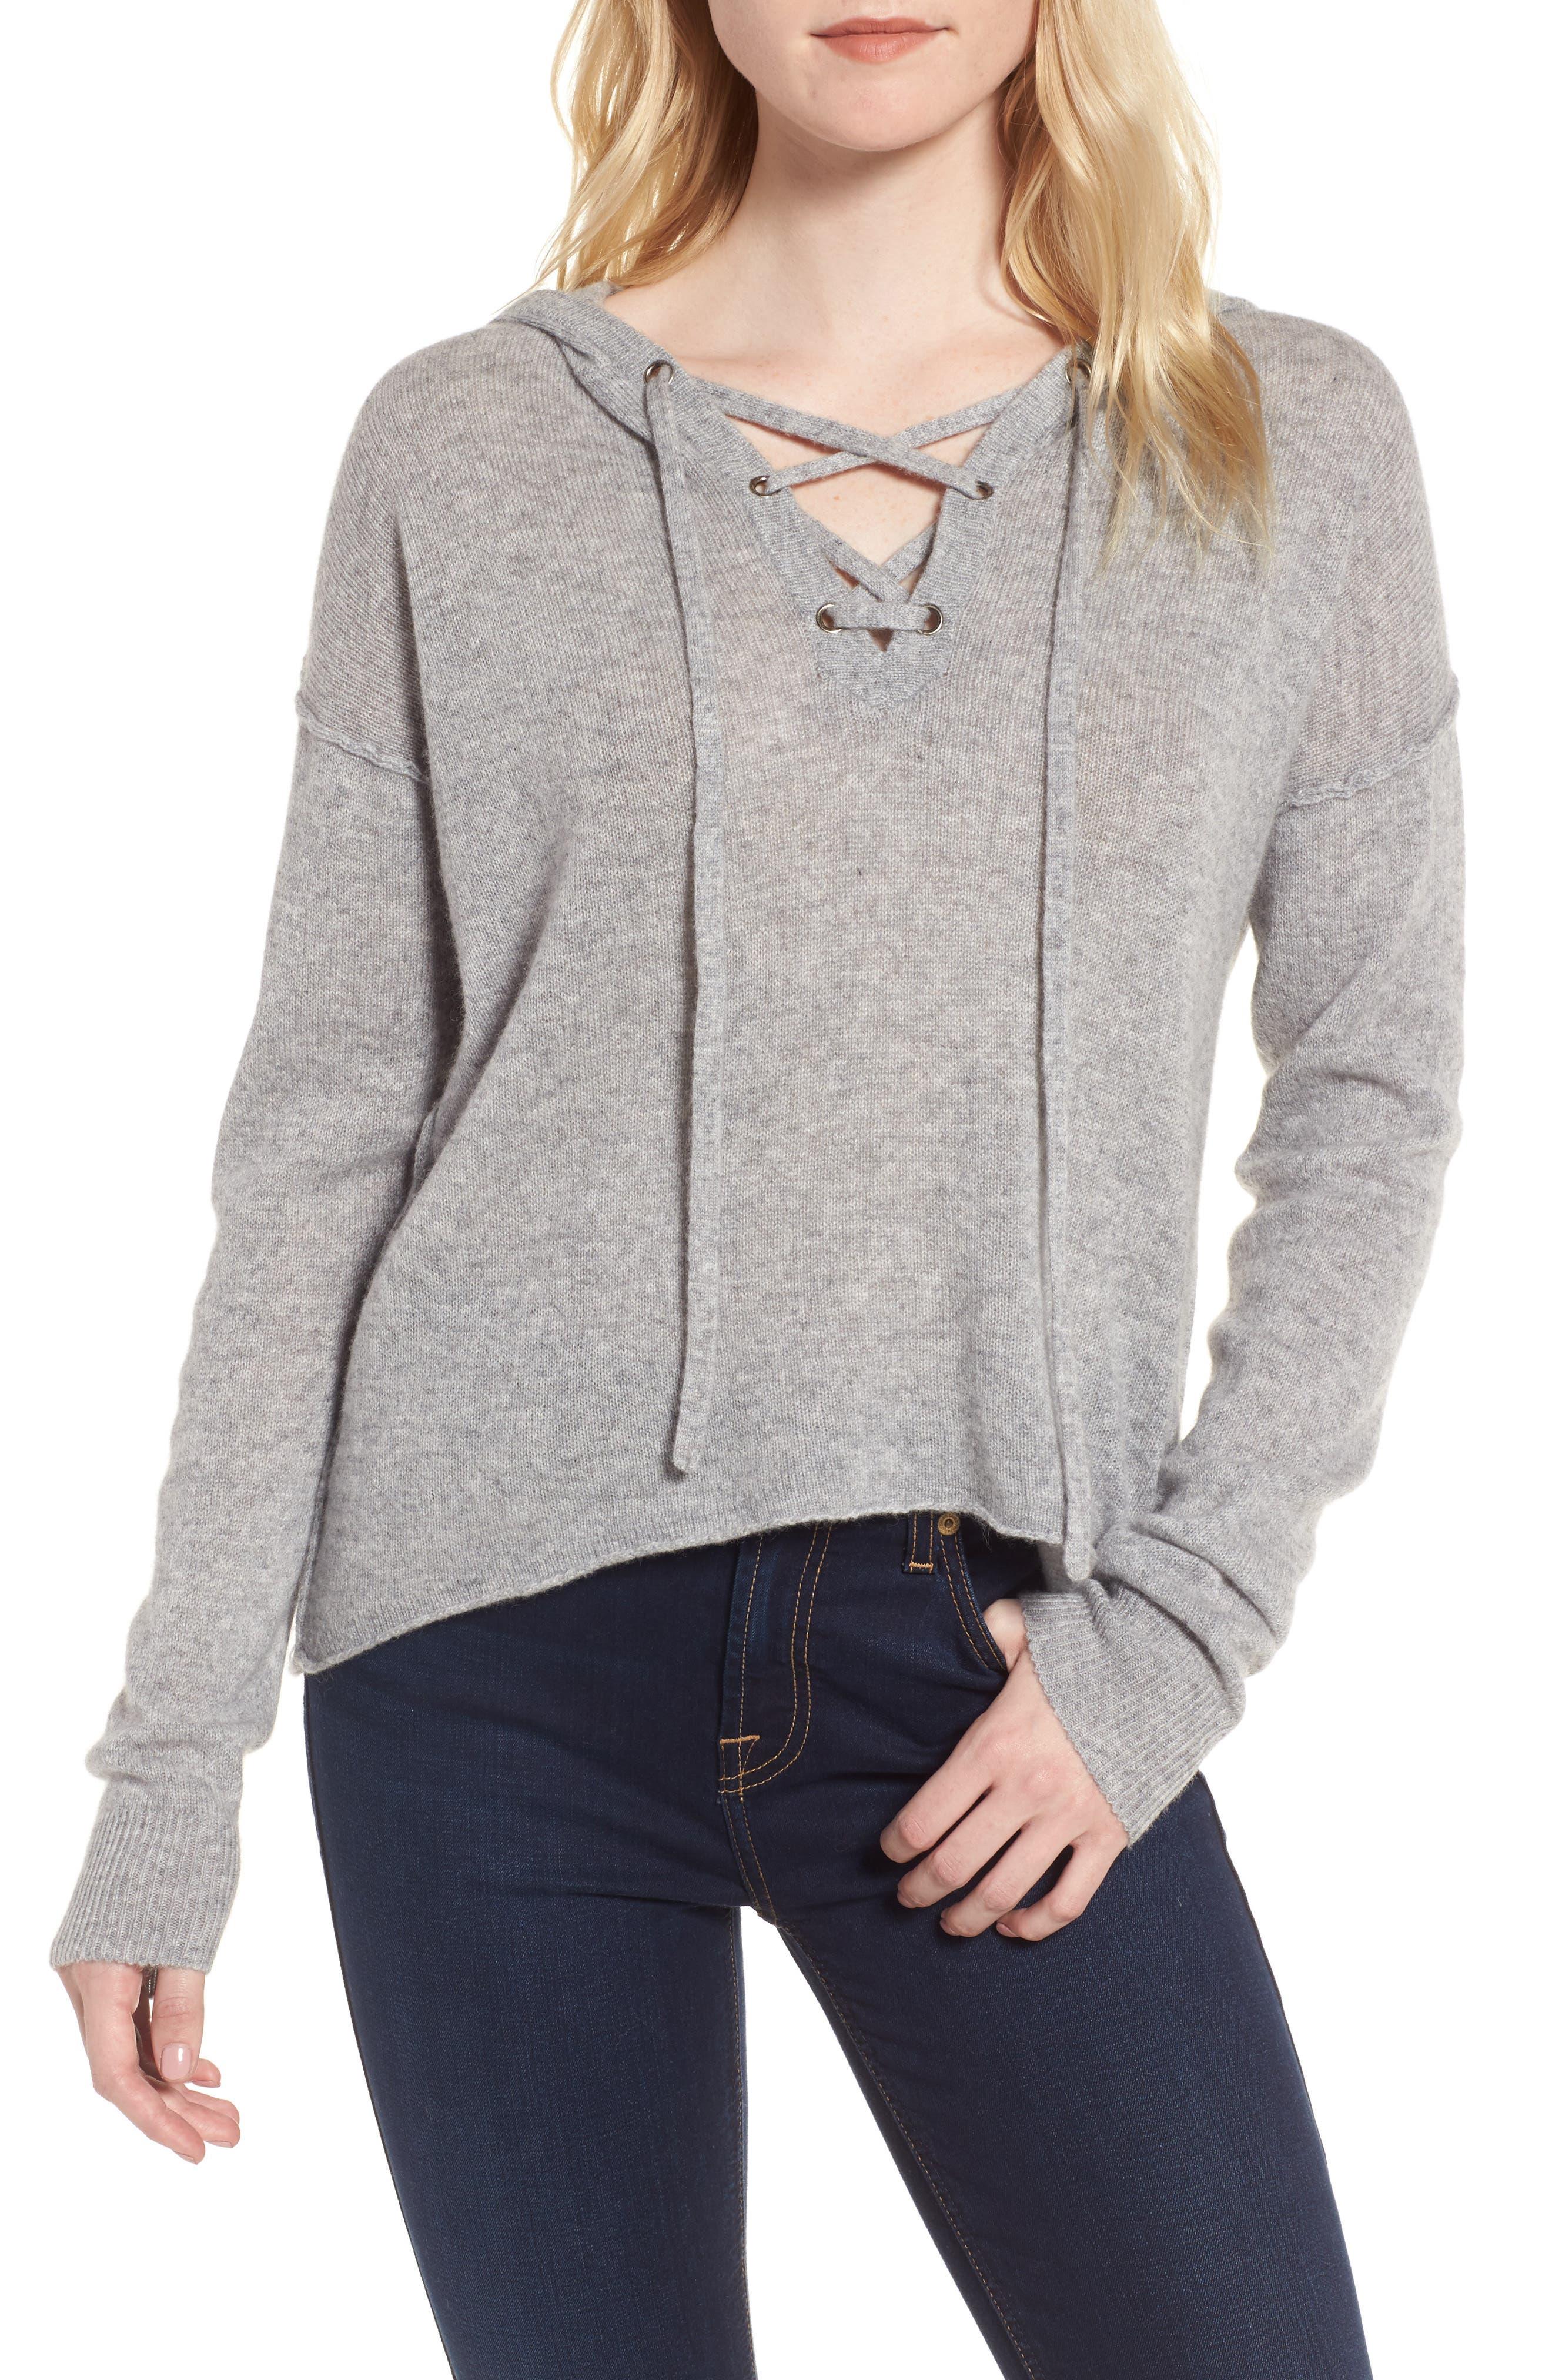 Dakota Cashmere Hooded Sweater,                             Main thumbnail 1, color,                             Heather Grey